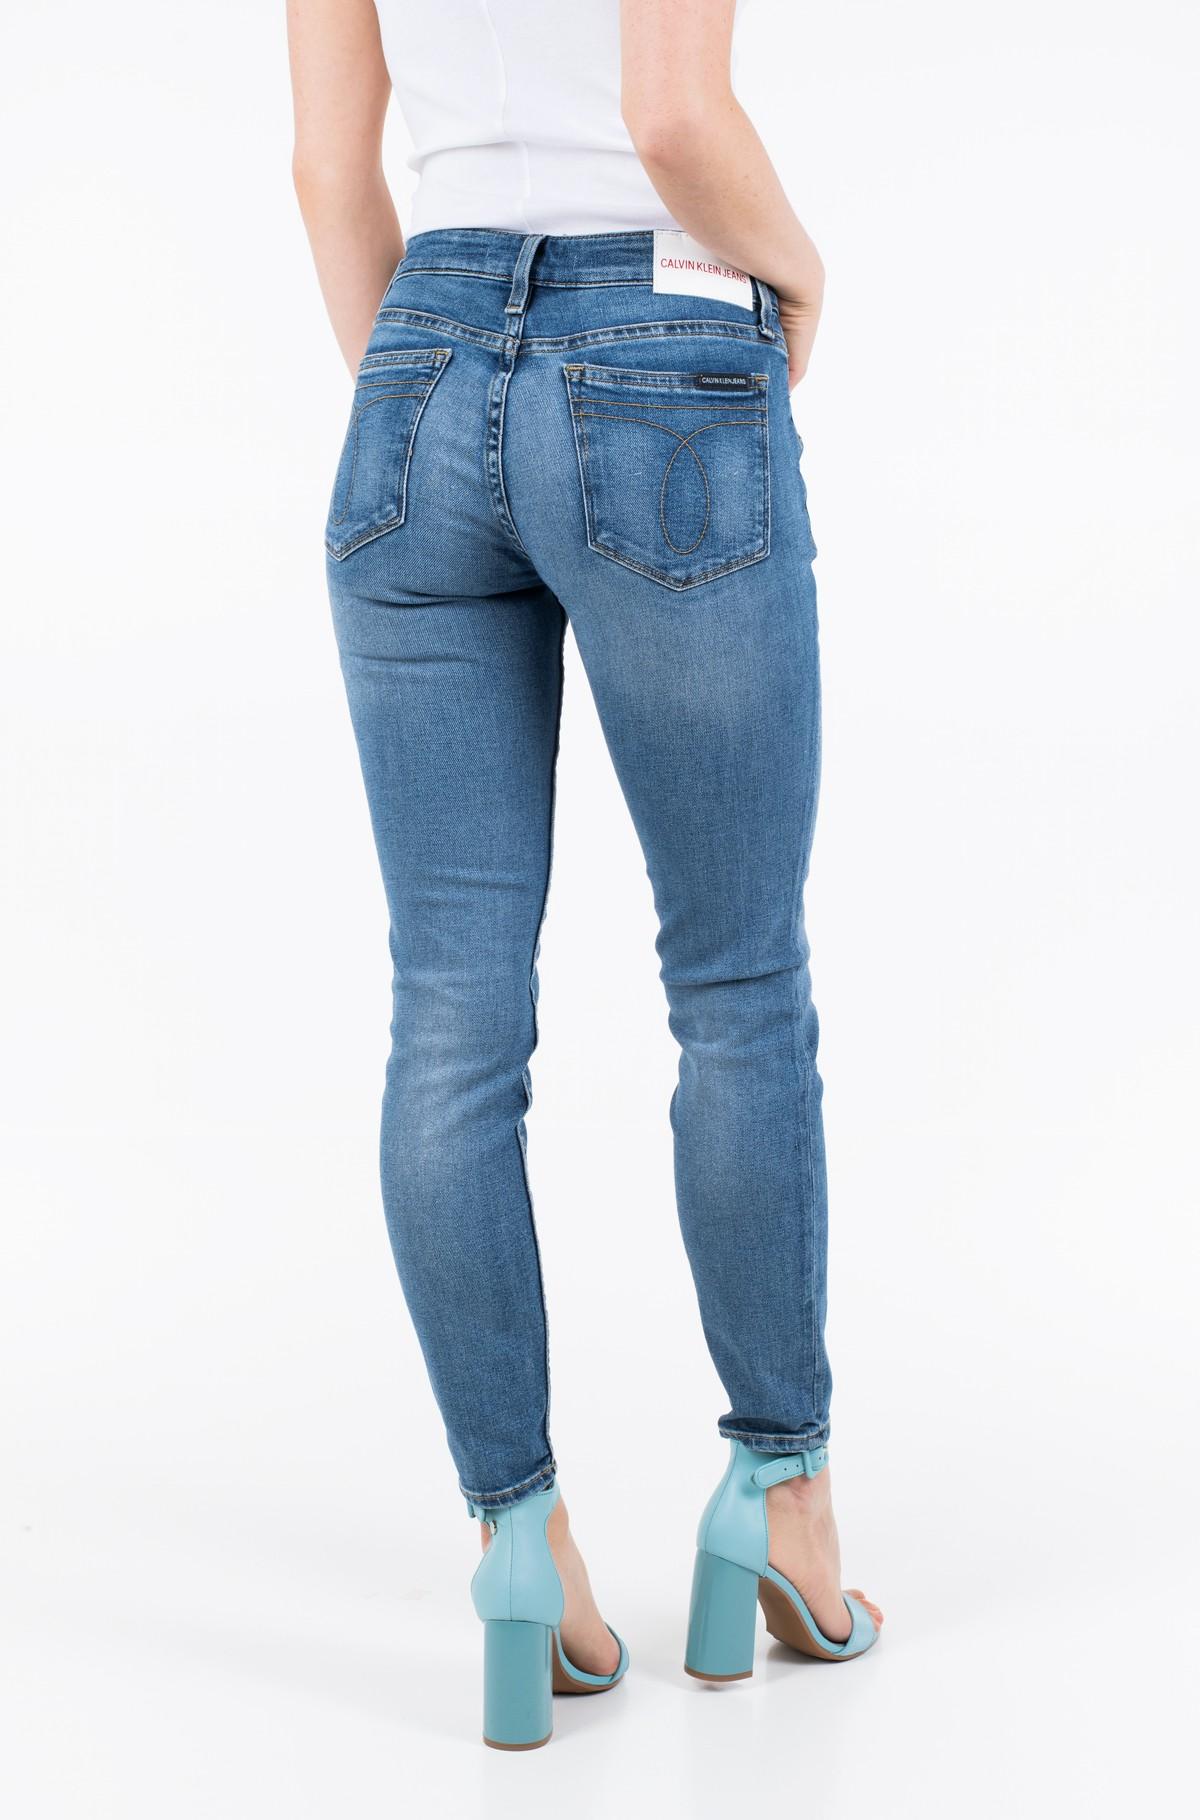 Jeans CKJ 011 MID RISE SKINNY ANKLE J20J210988-full-2